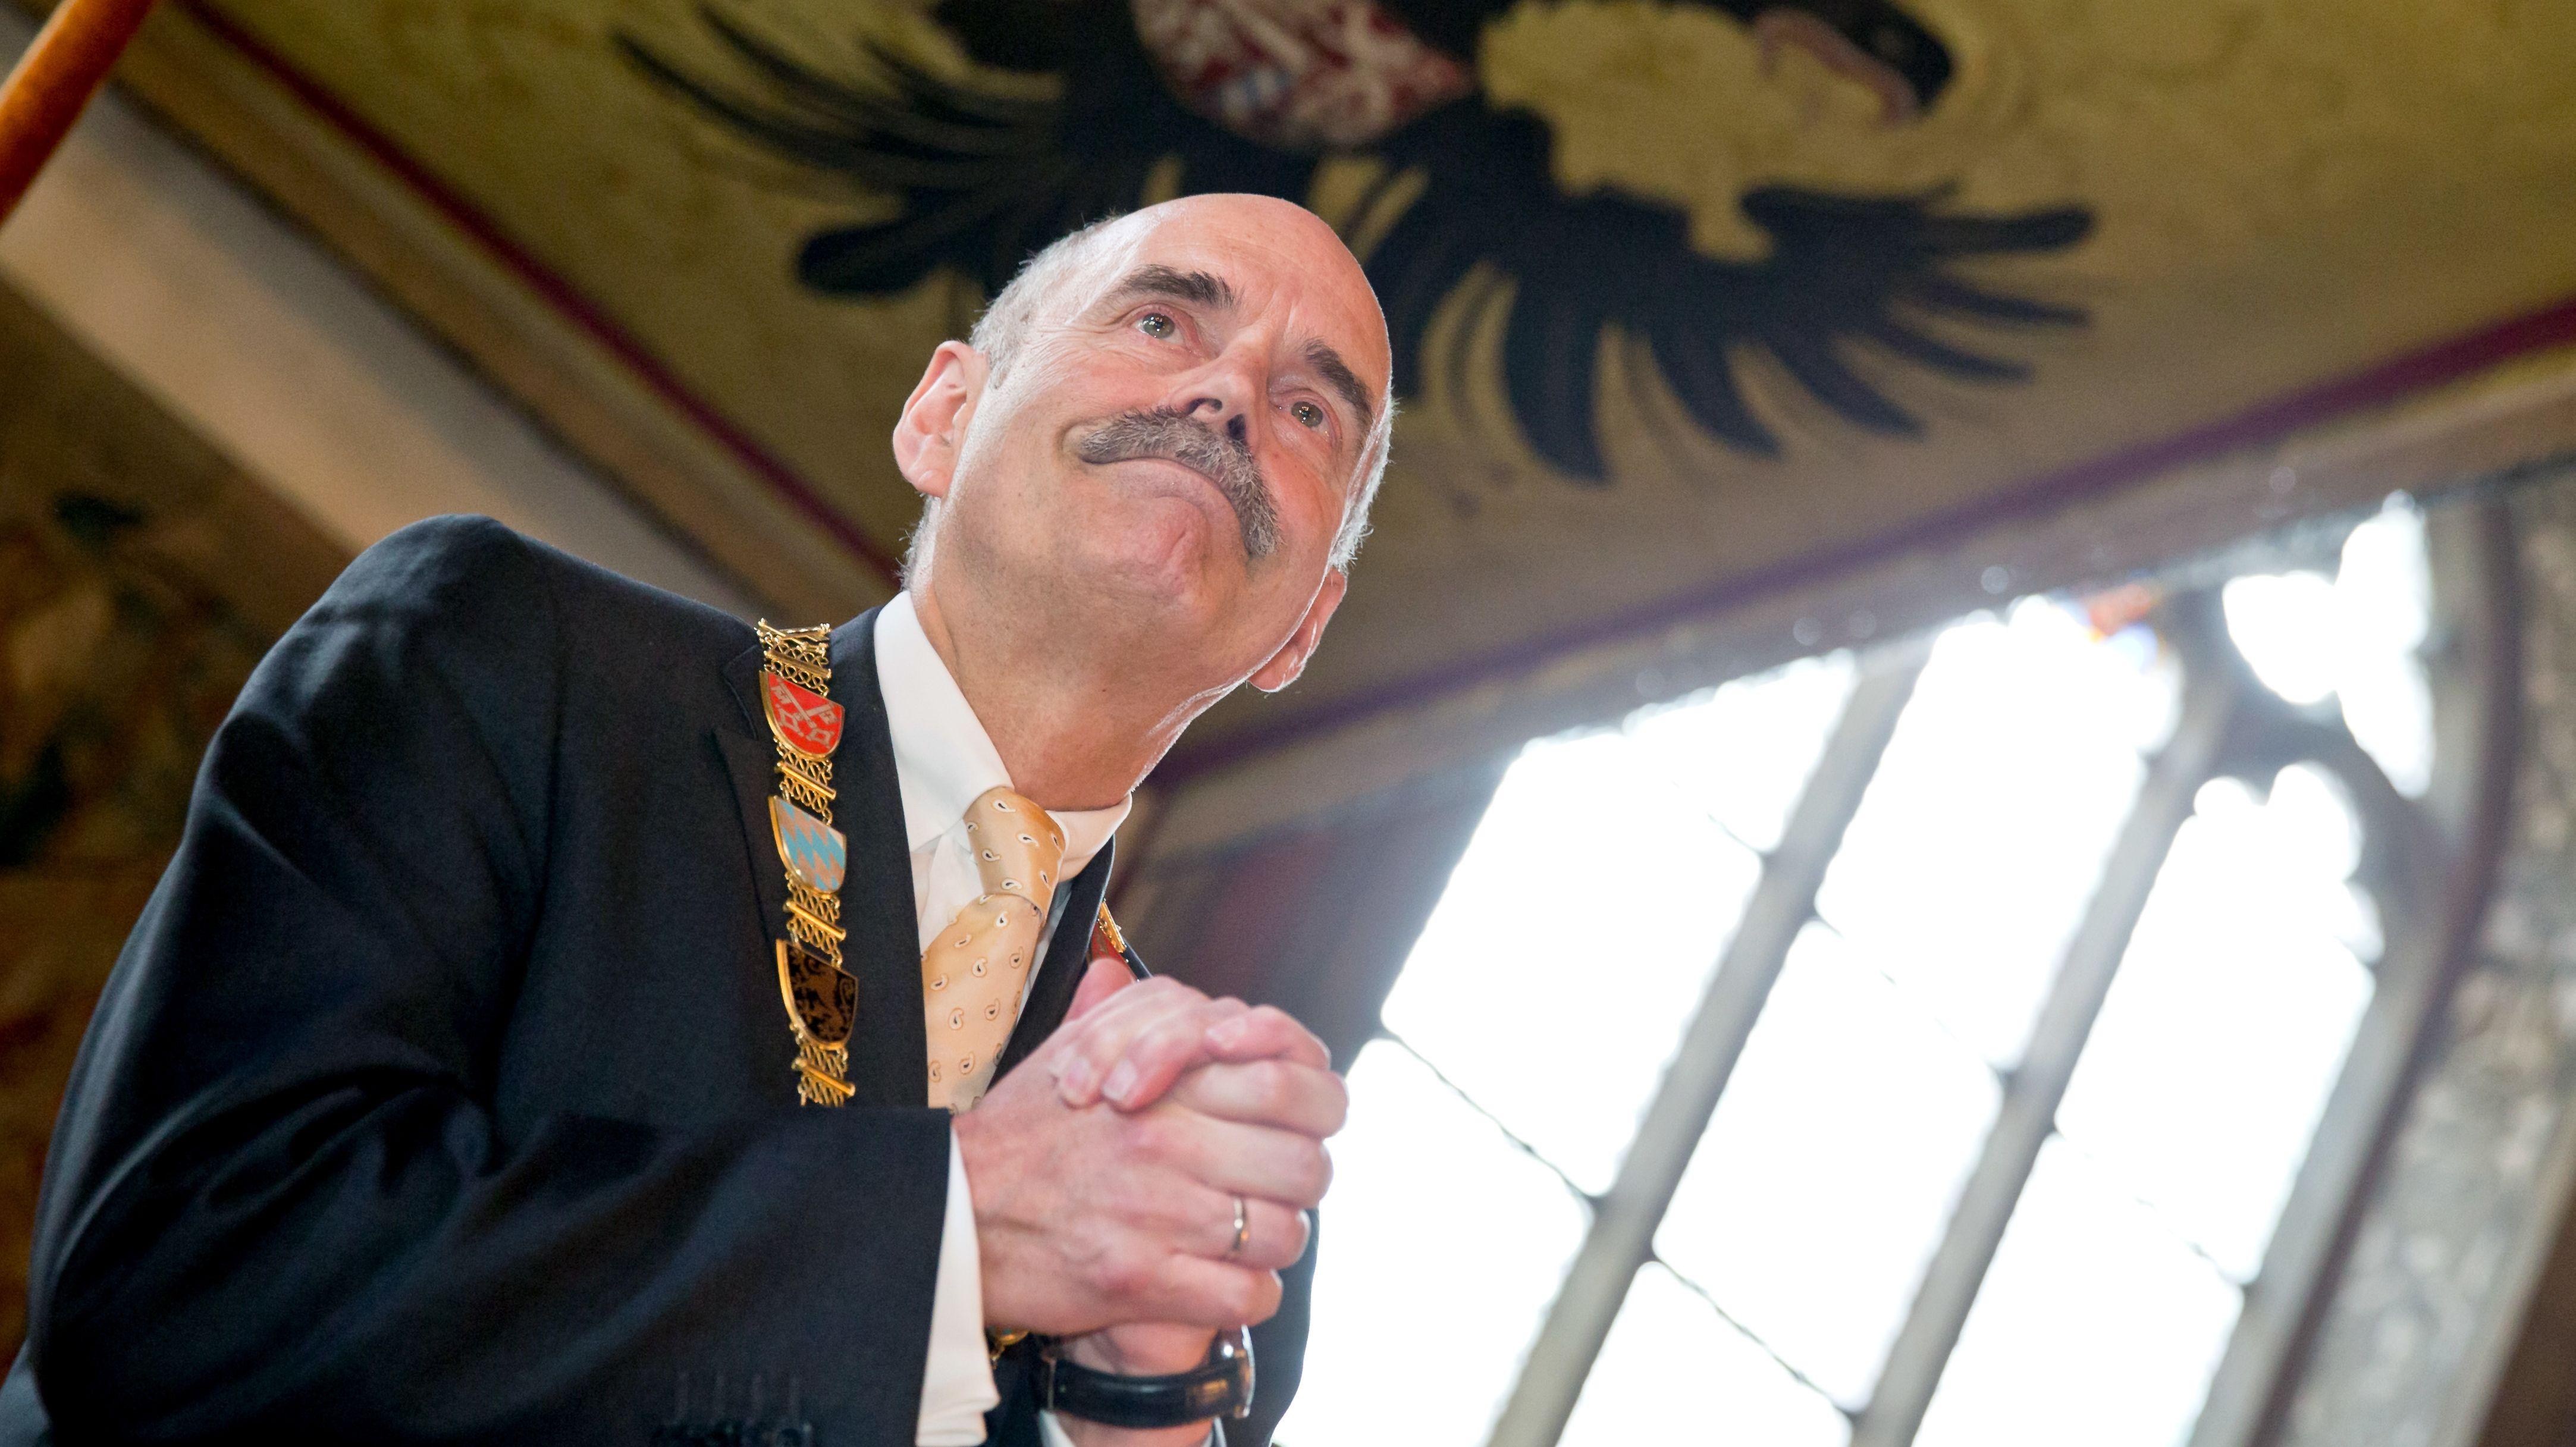 Regensburgs Ex-Oberbürgermeister Hans Schaidinger